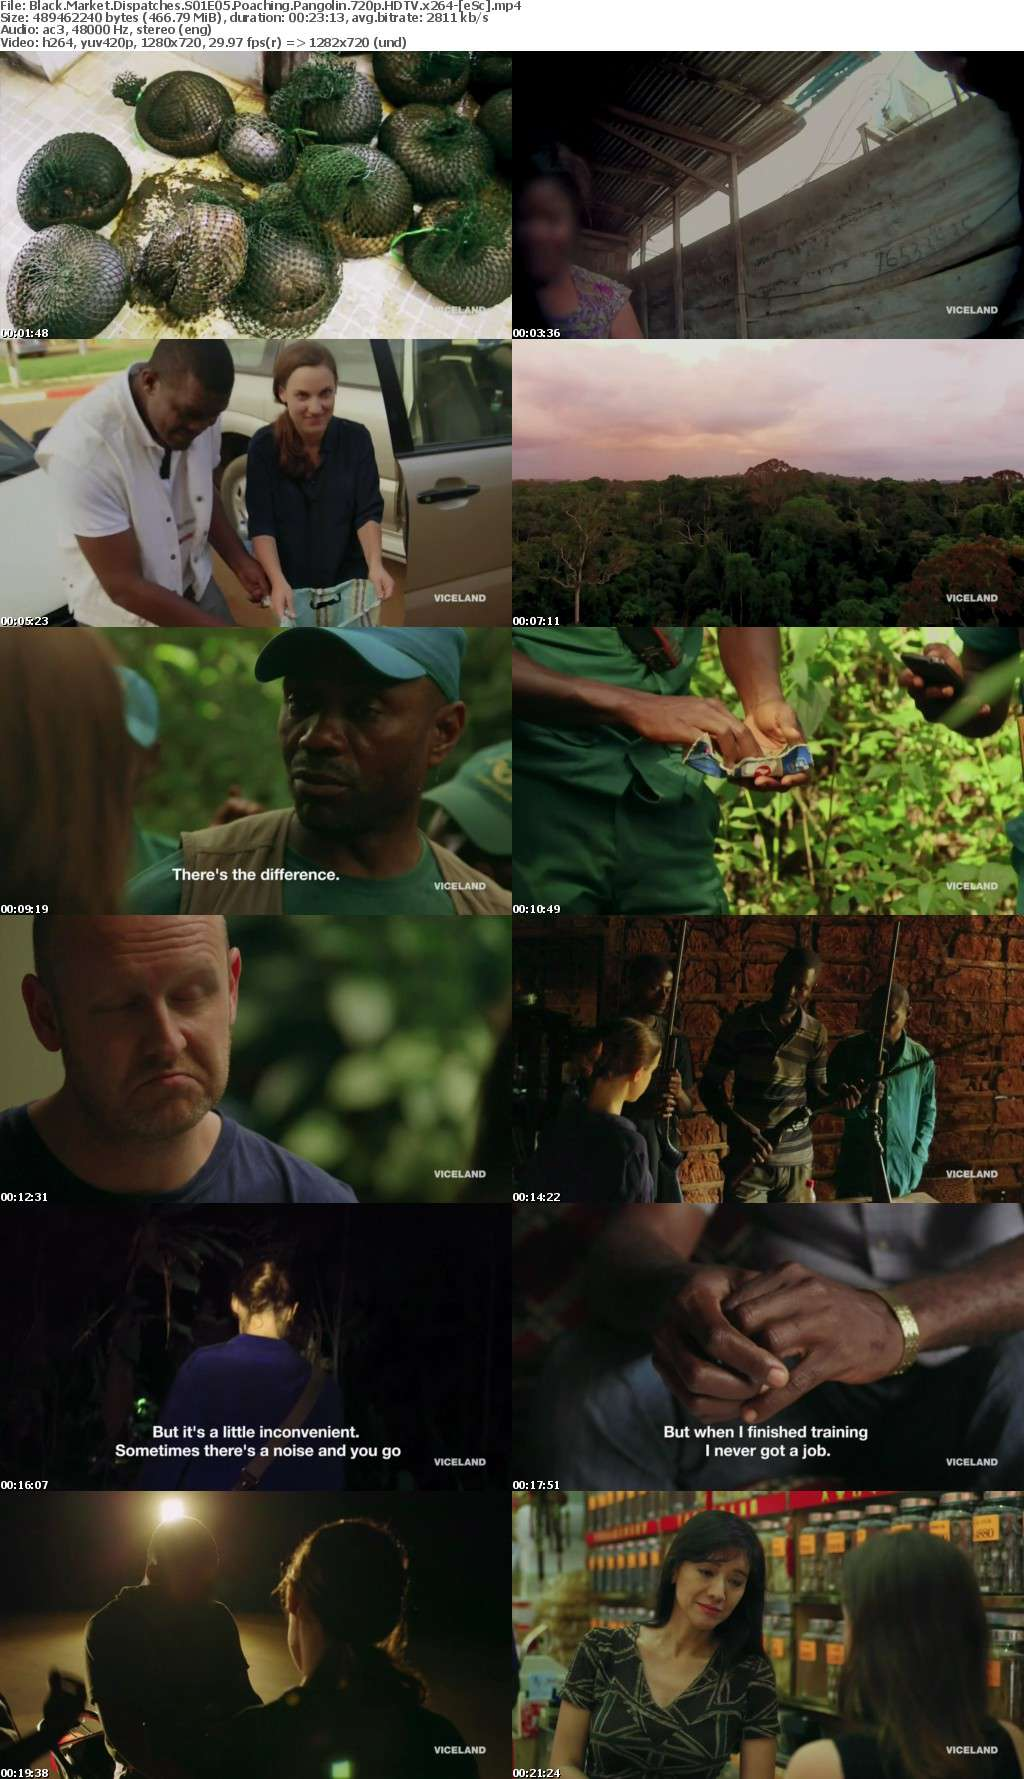 Black Market Dispatches S01E05 Poaching Pangolin 720p HDTV x264-[eSc]